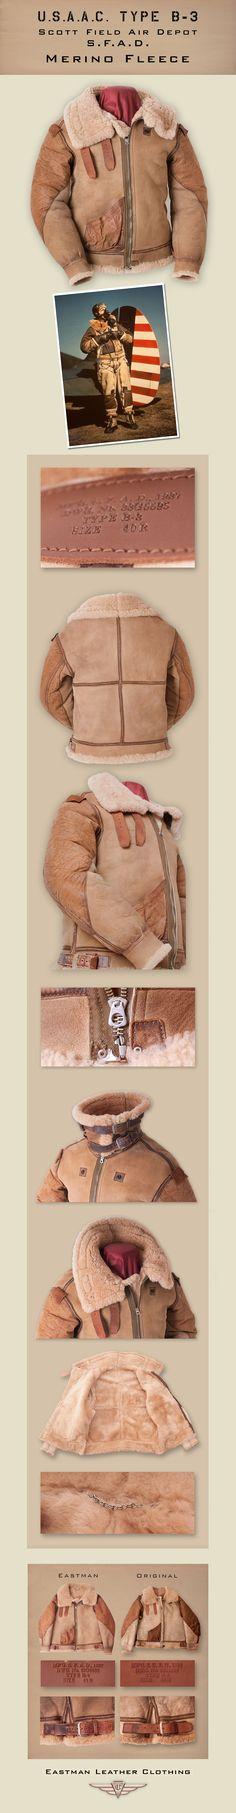 Eastman Leather Clothing - US Flight Jackets : Original Maker Jackets : B-3sfad.